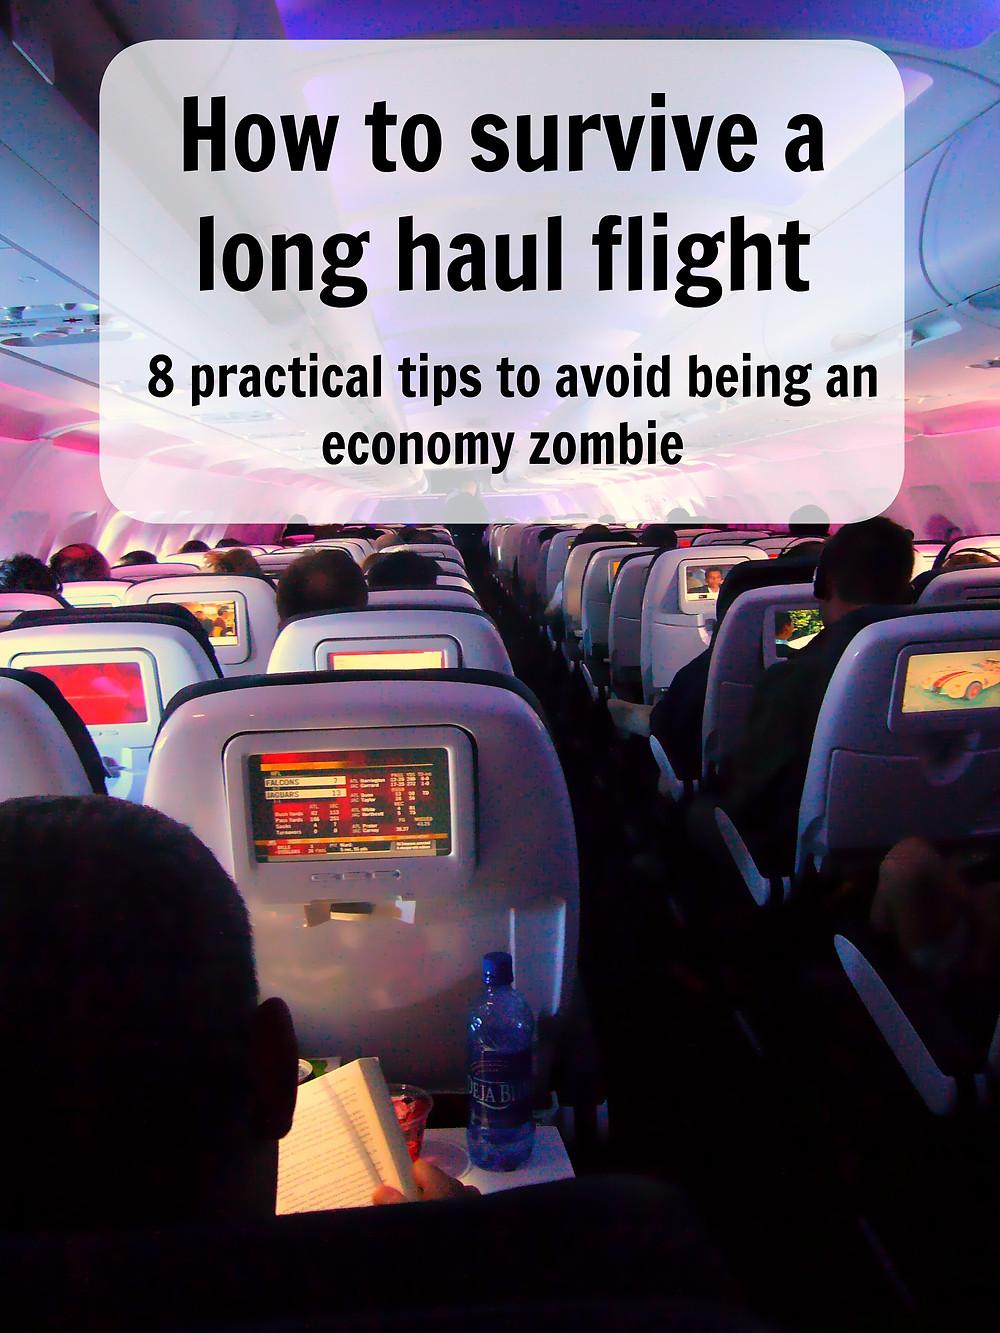 Surviving long haul flights